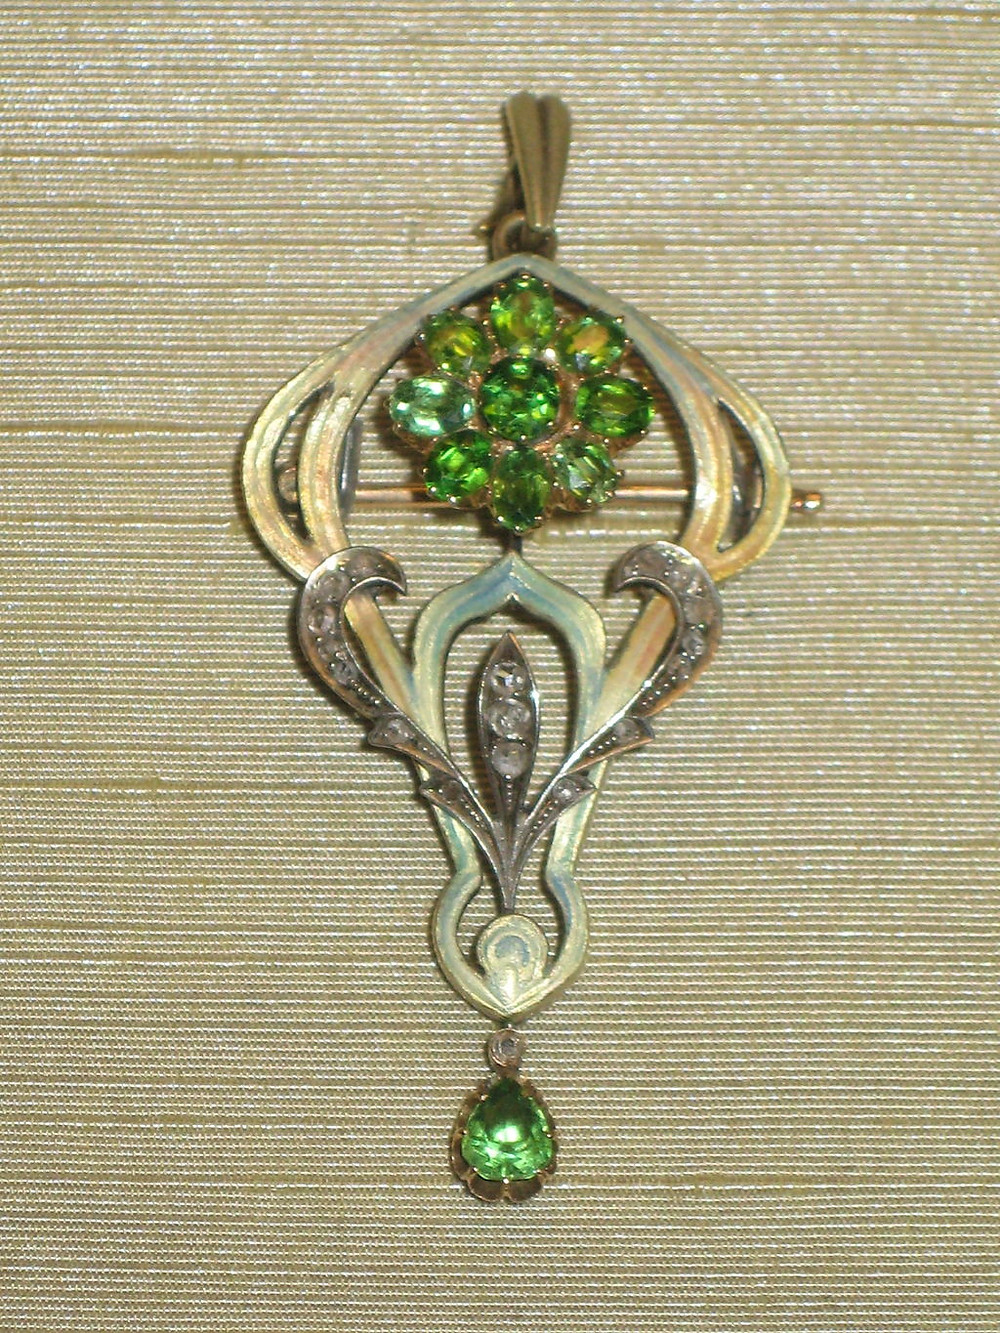 Pendant Brooch Jewellery Piece Featuring Demantoid Garnets